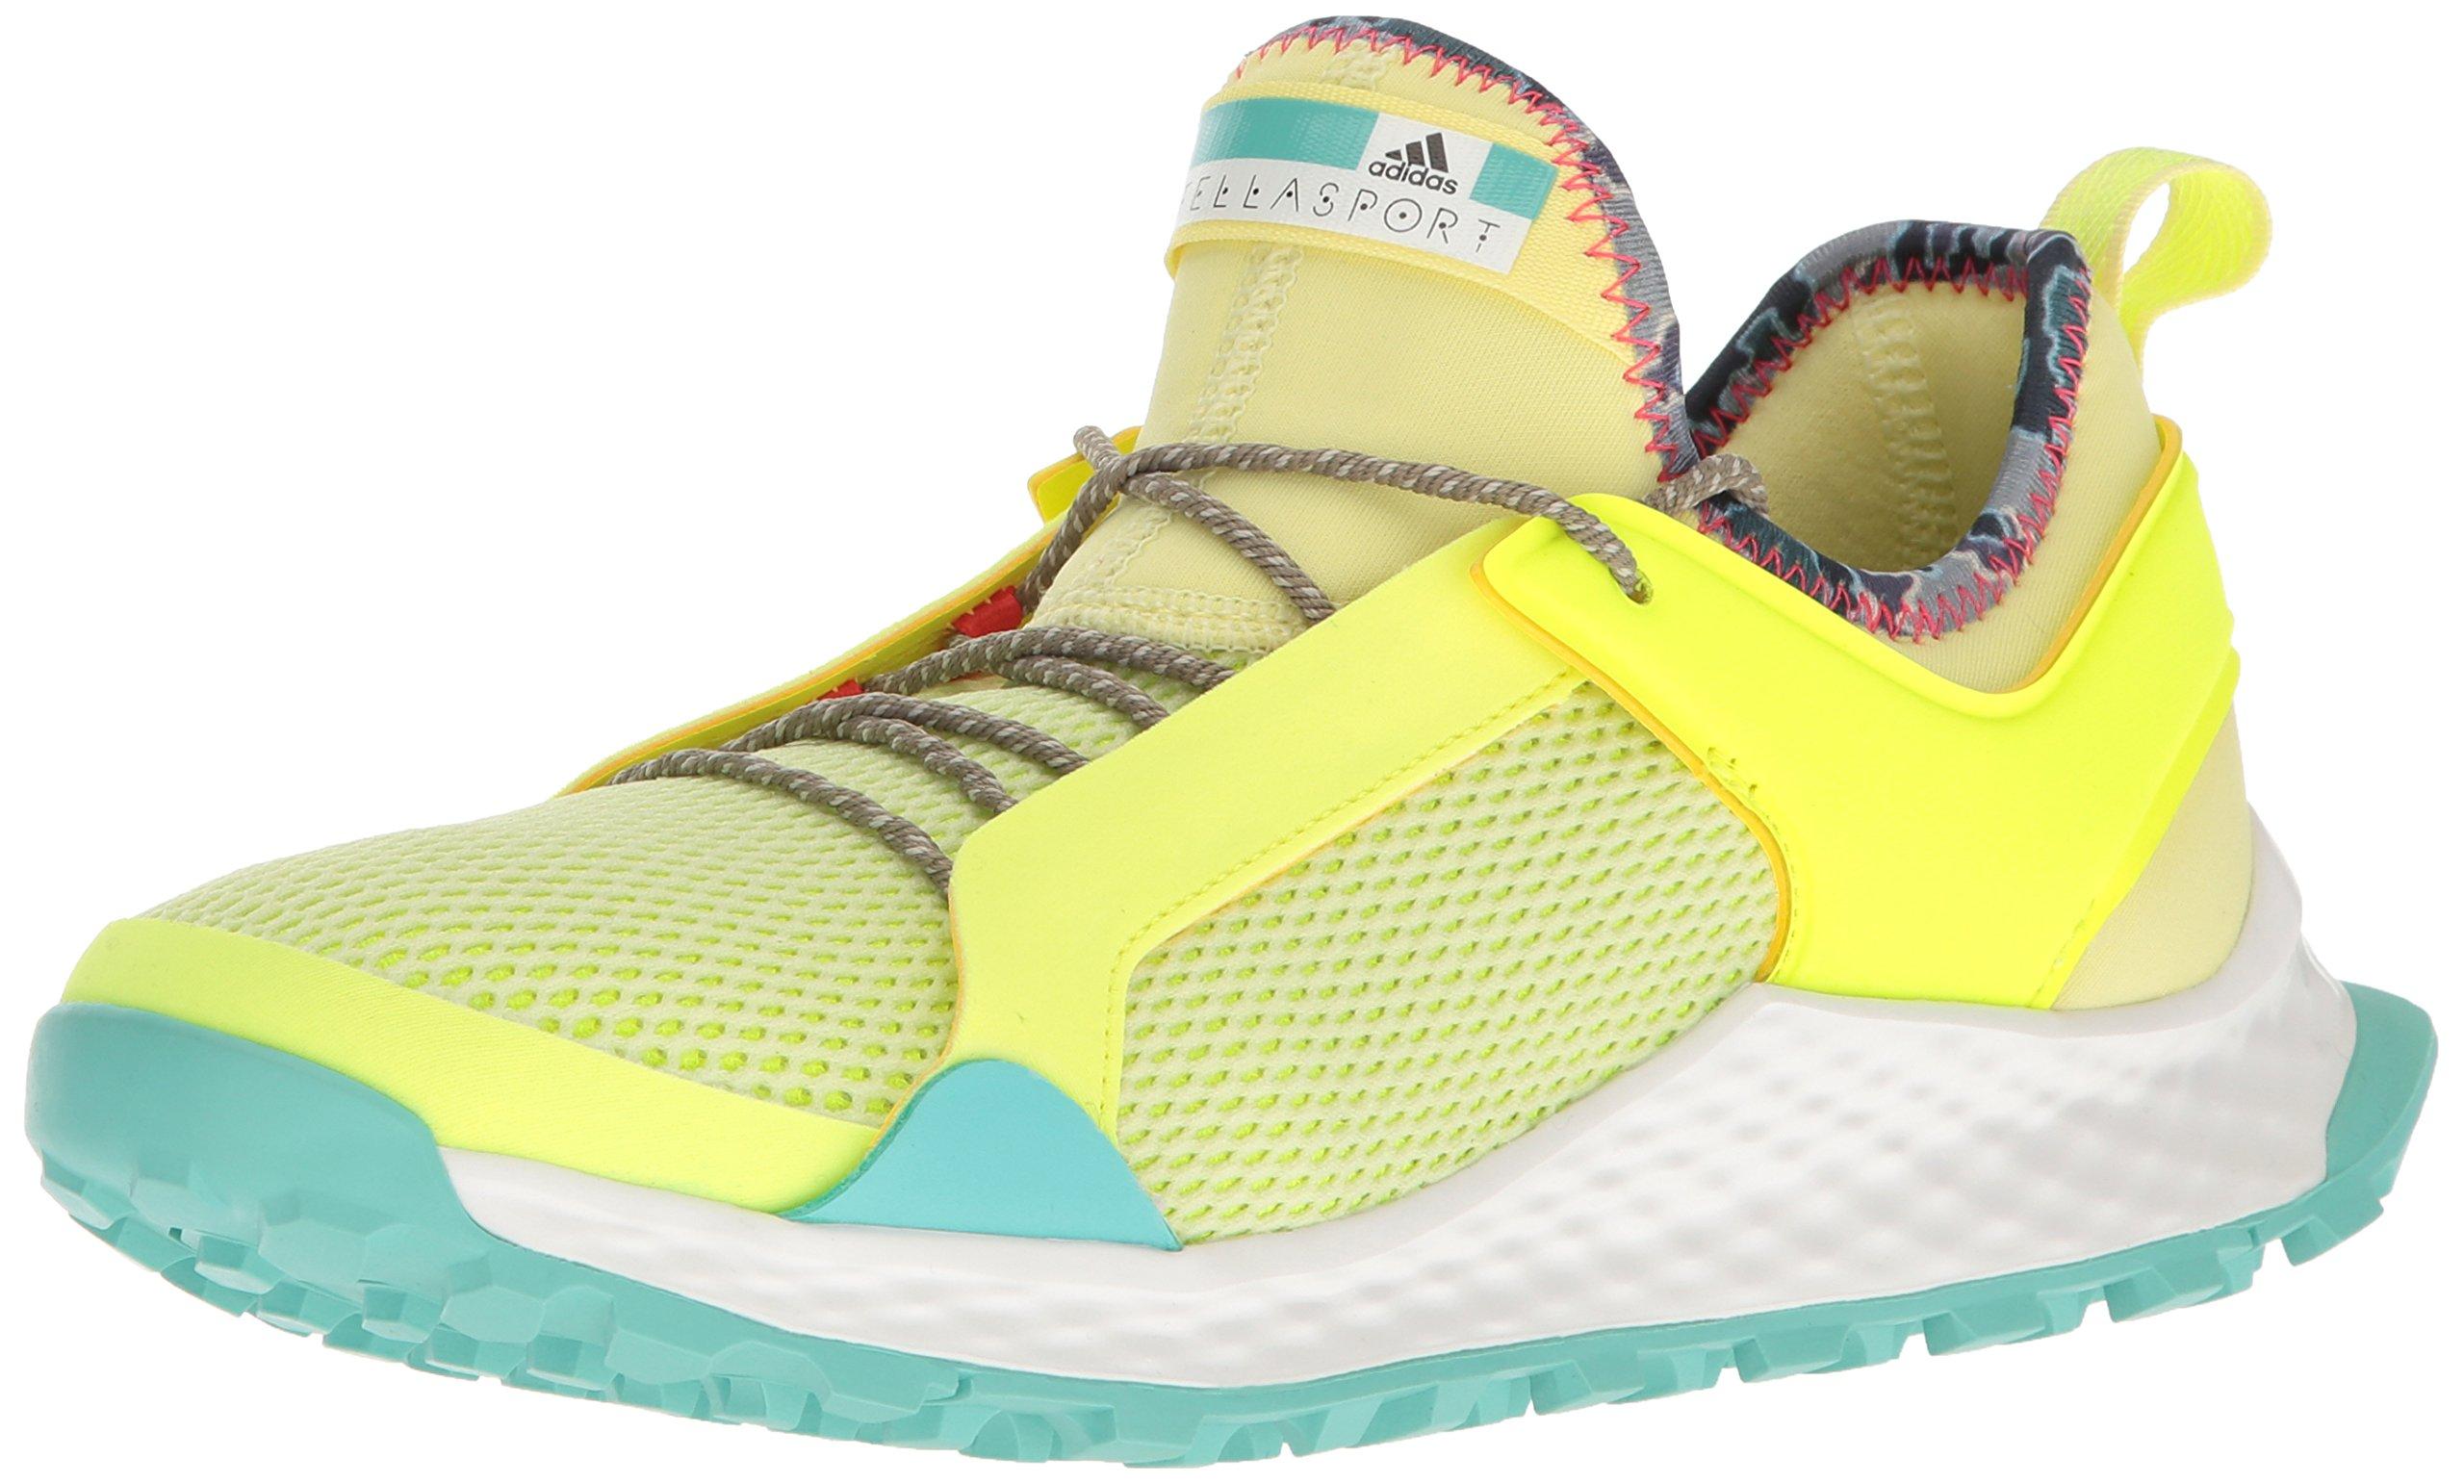 Aleki X Cross-Trainer Shoe